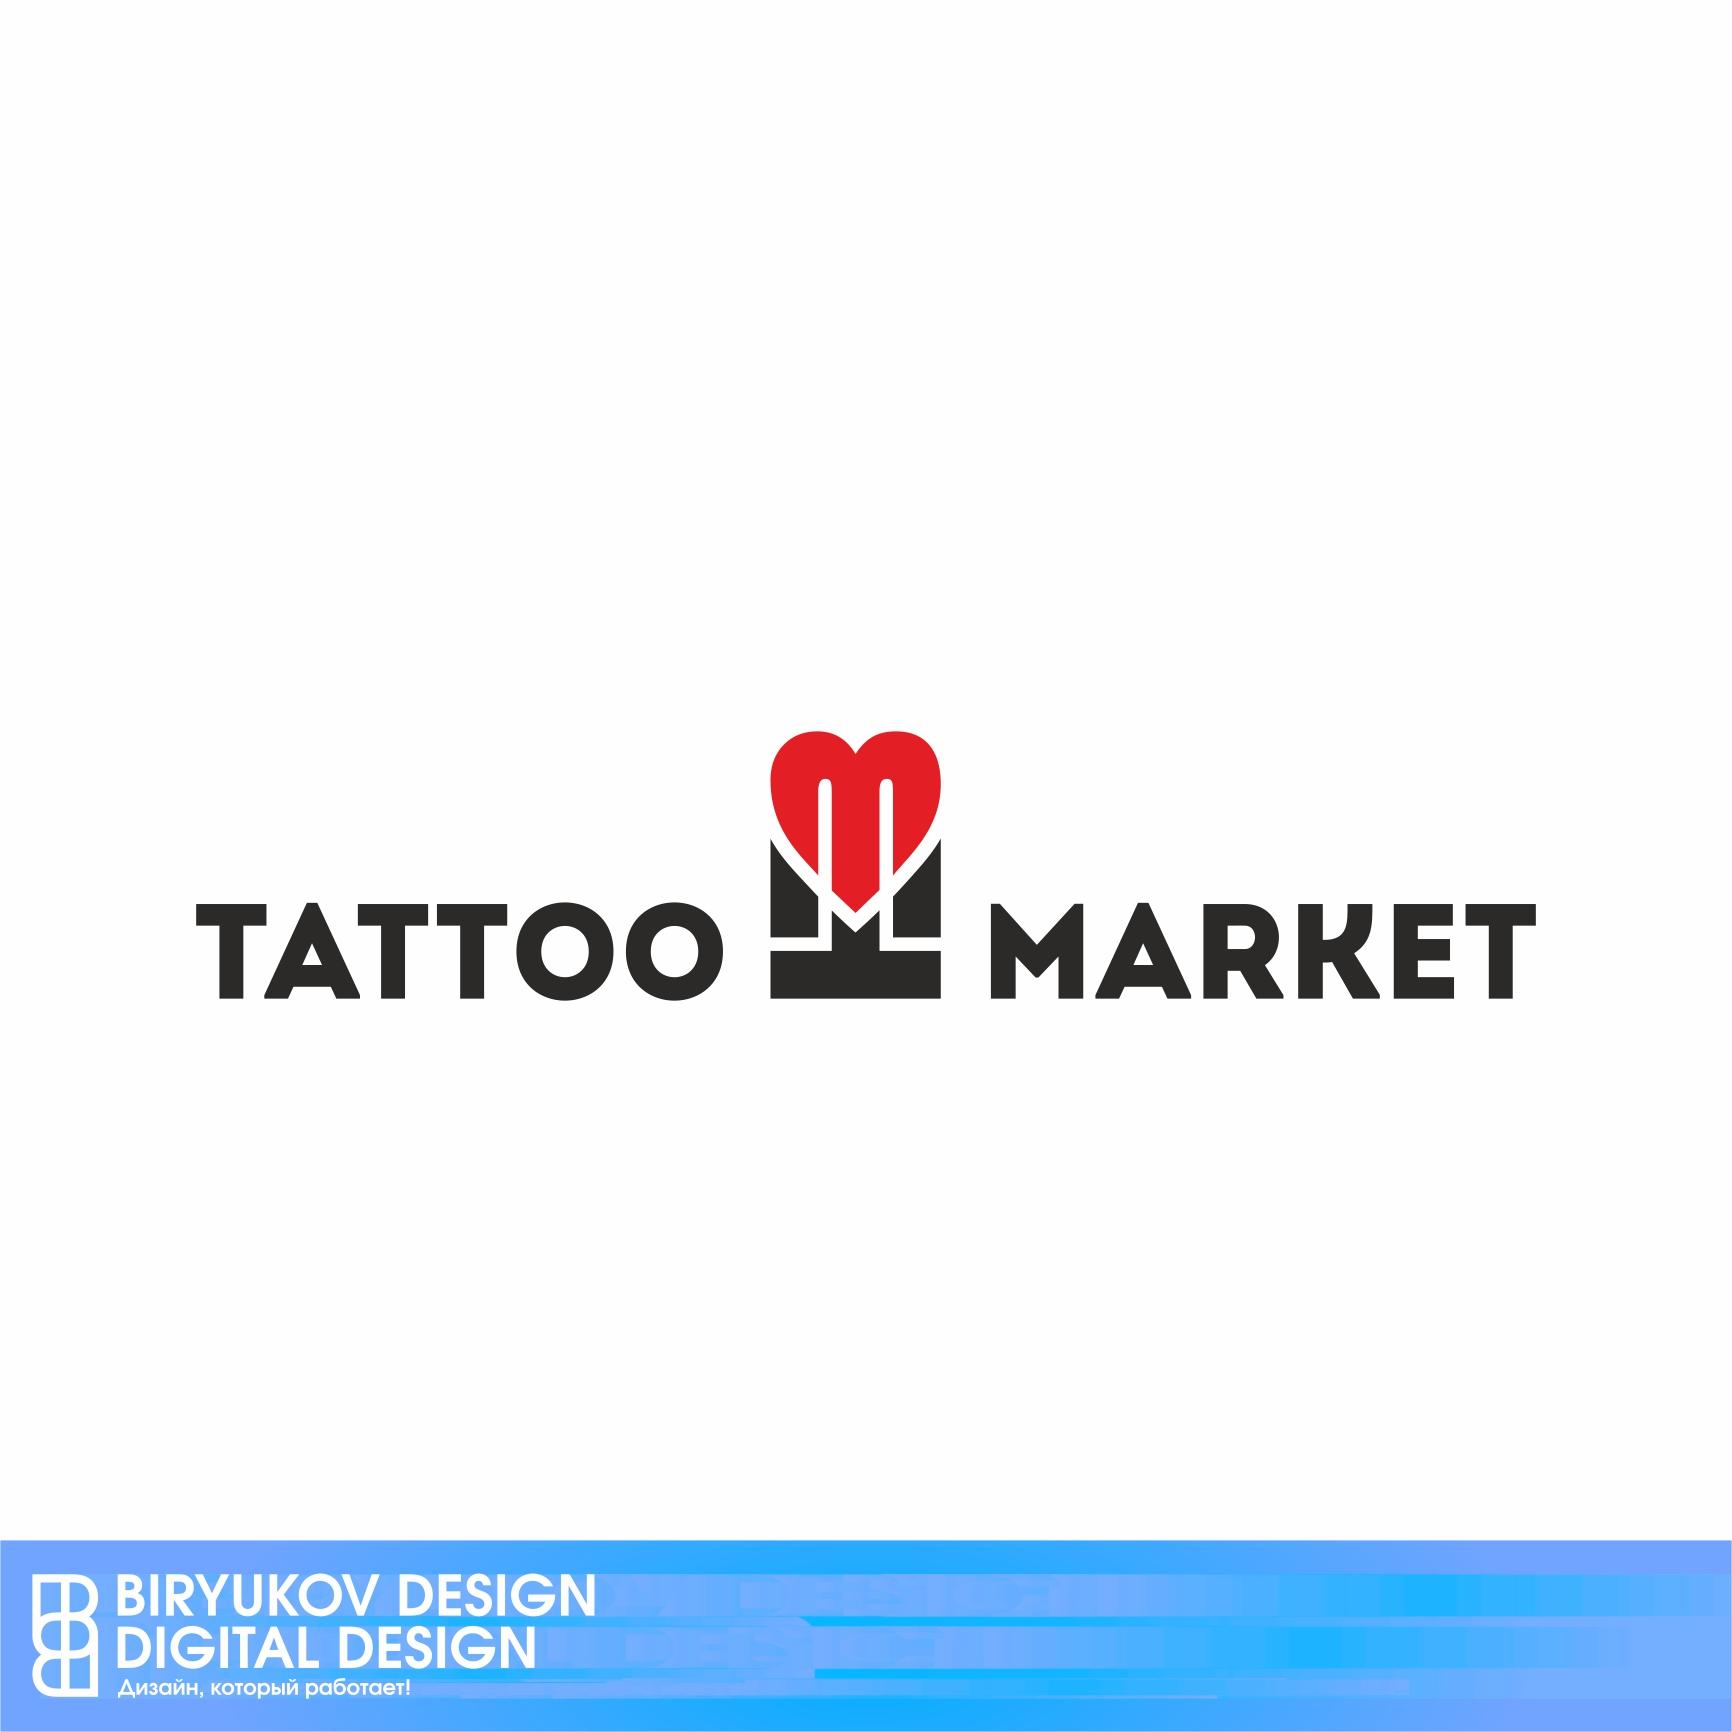 Редизайн логотипа магазина тату оборудования TattooMarket.ru фото f_1035c3a4bbe1ec8d.jpg